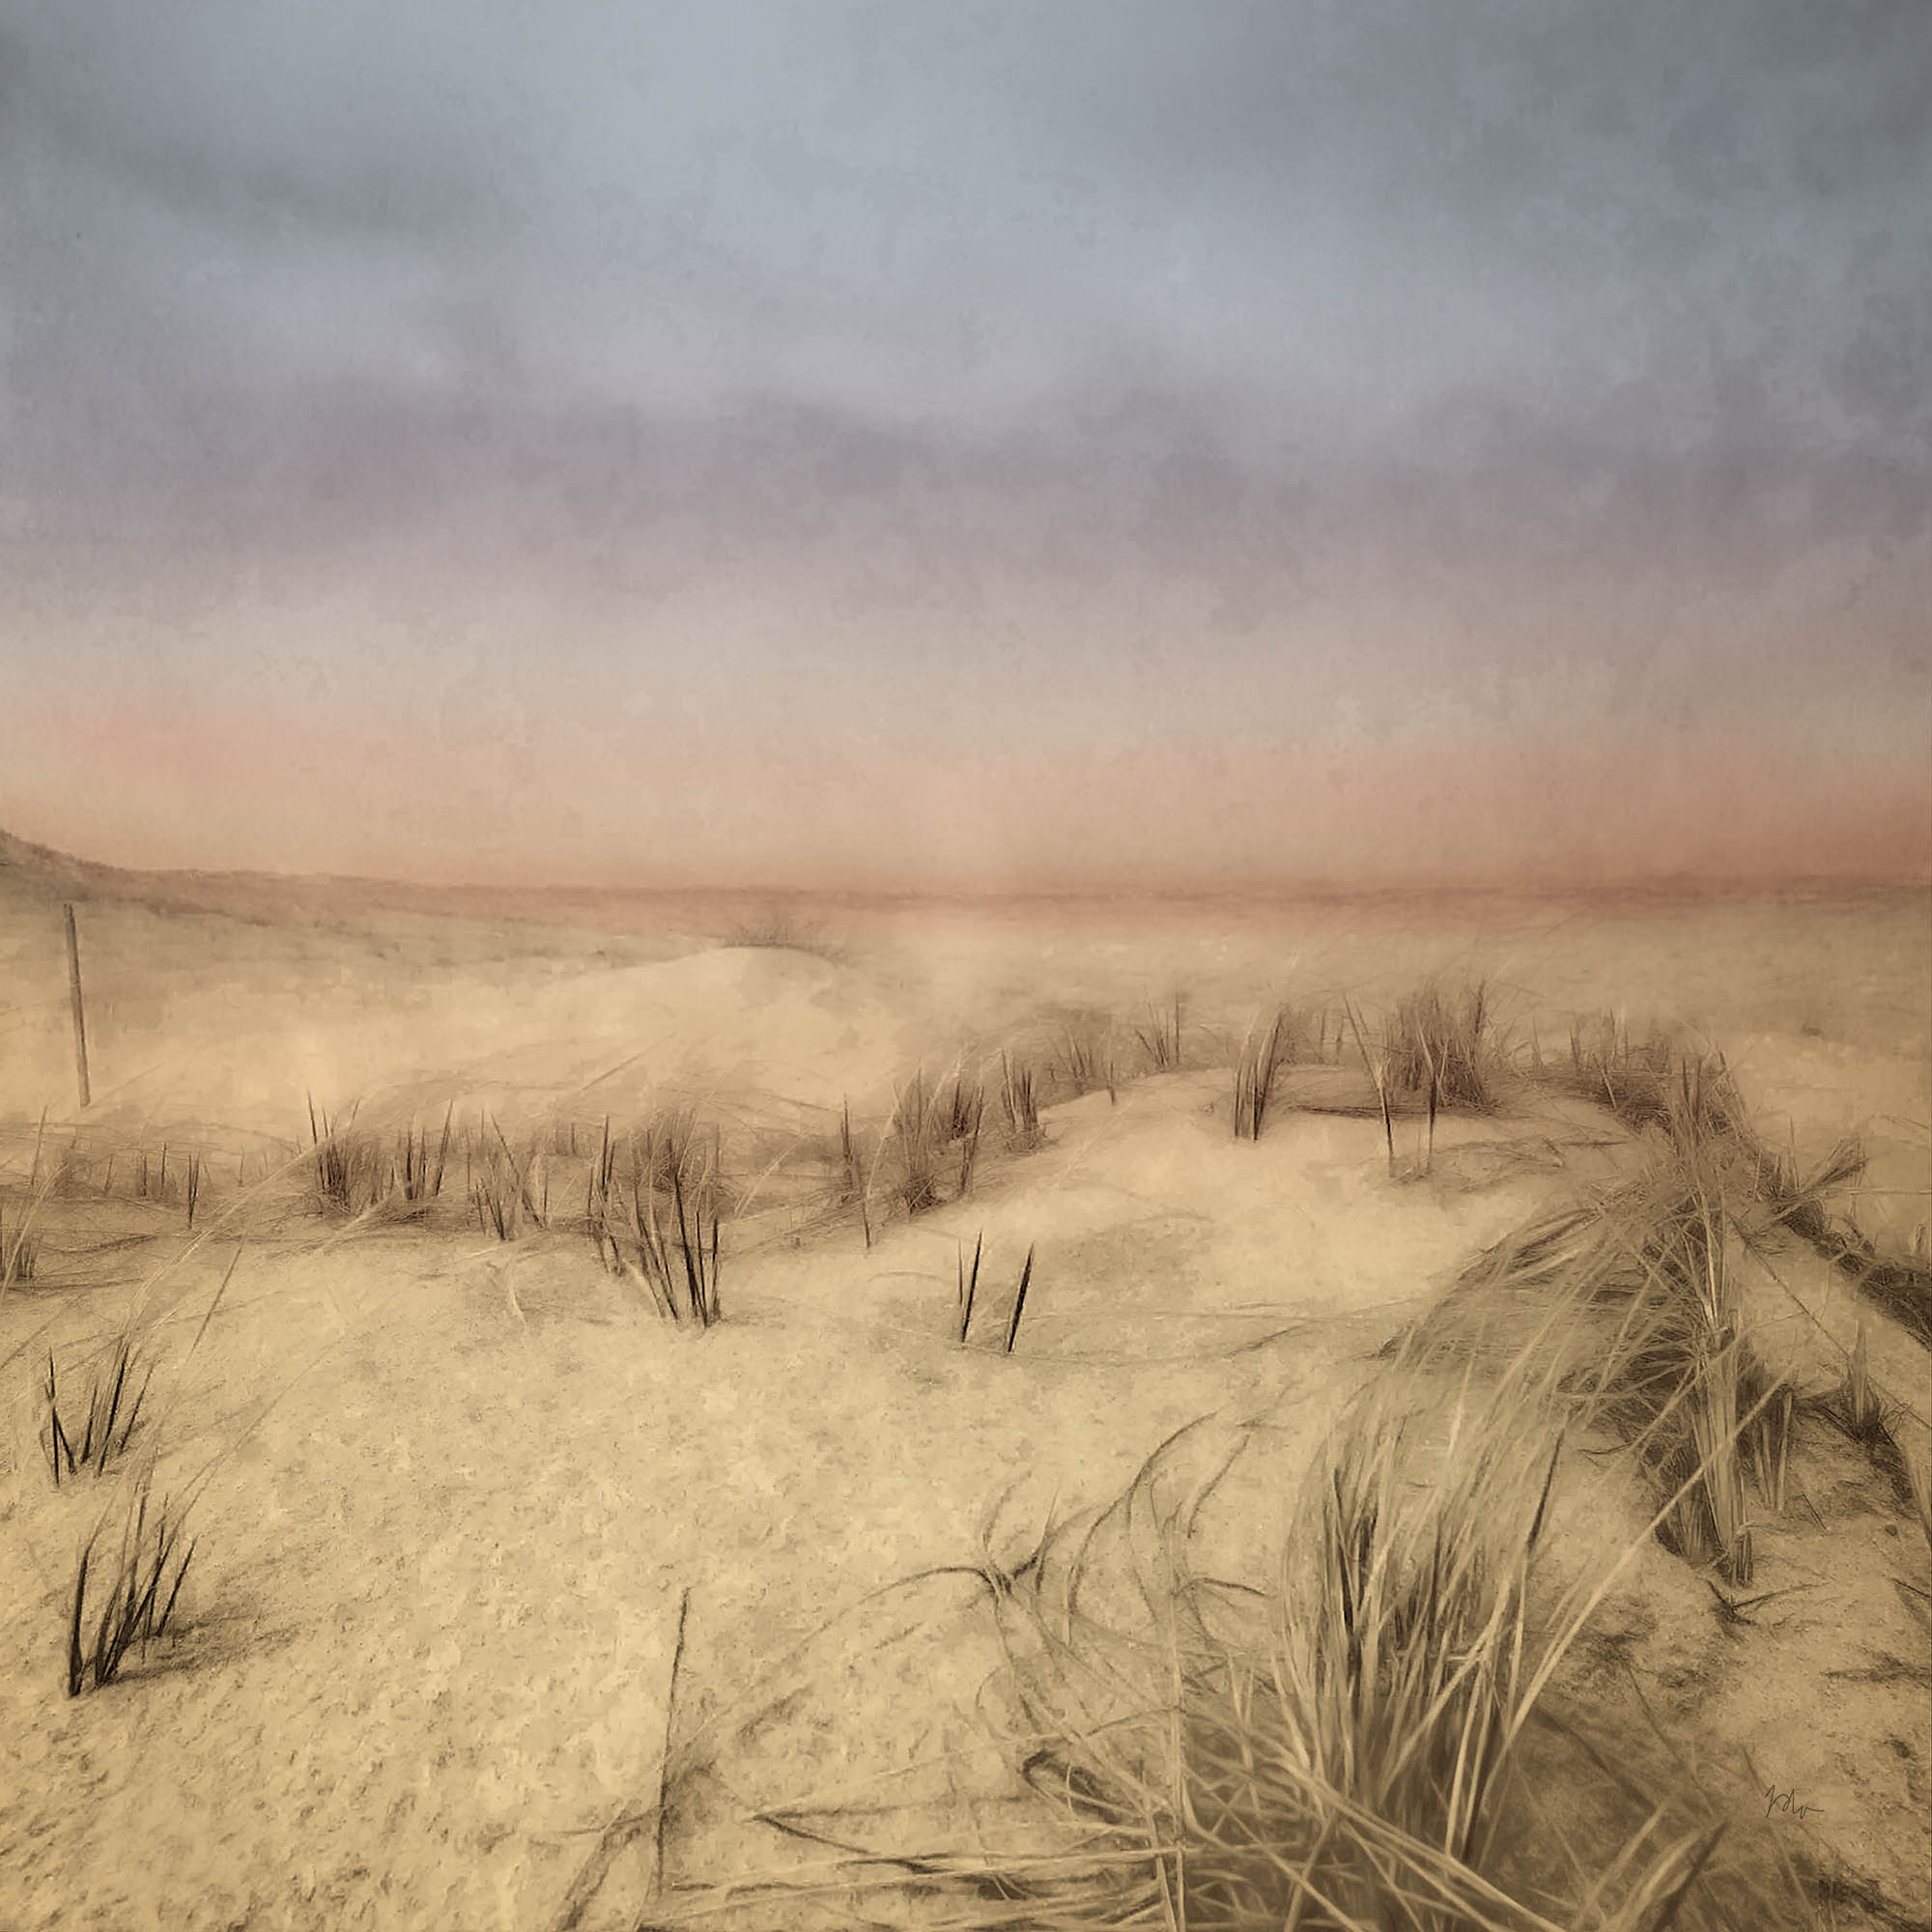 dunes at dusk copy